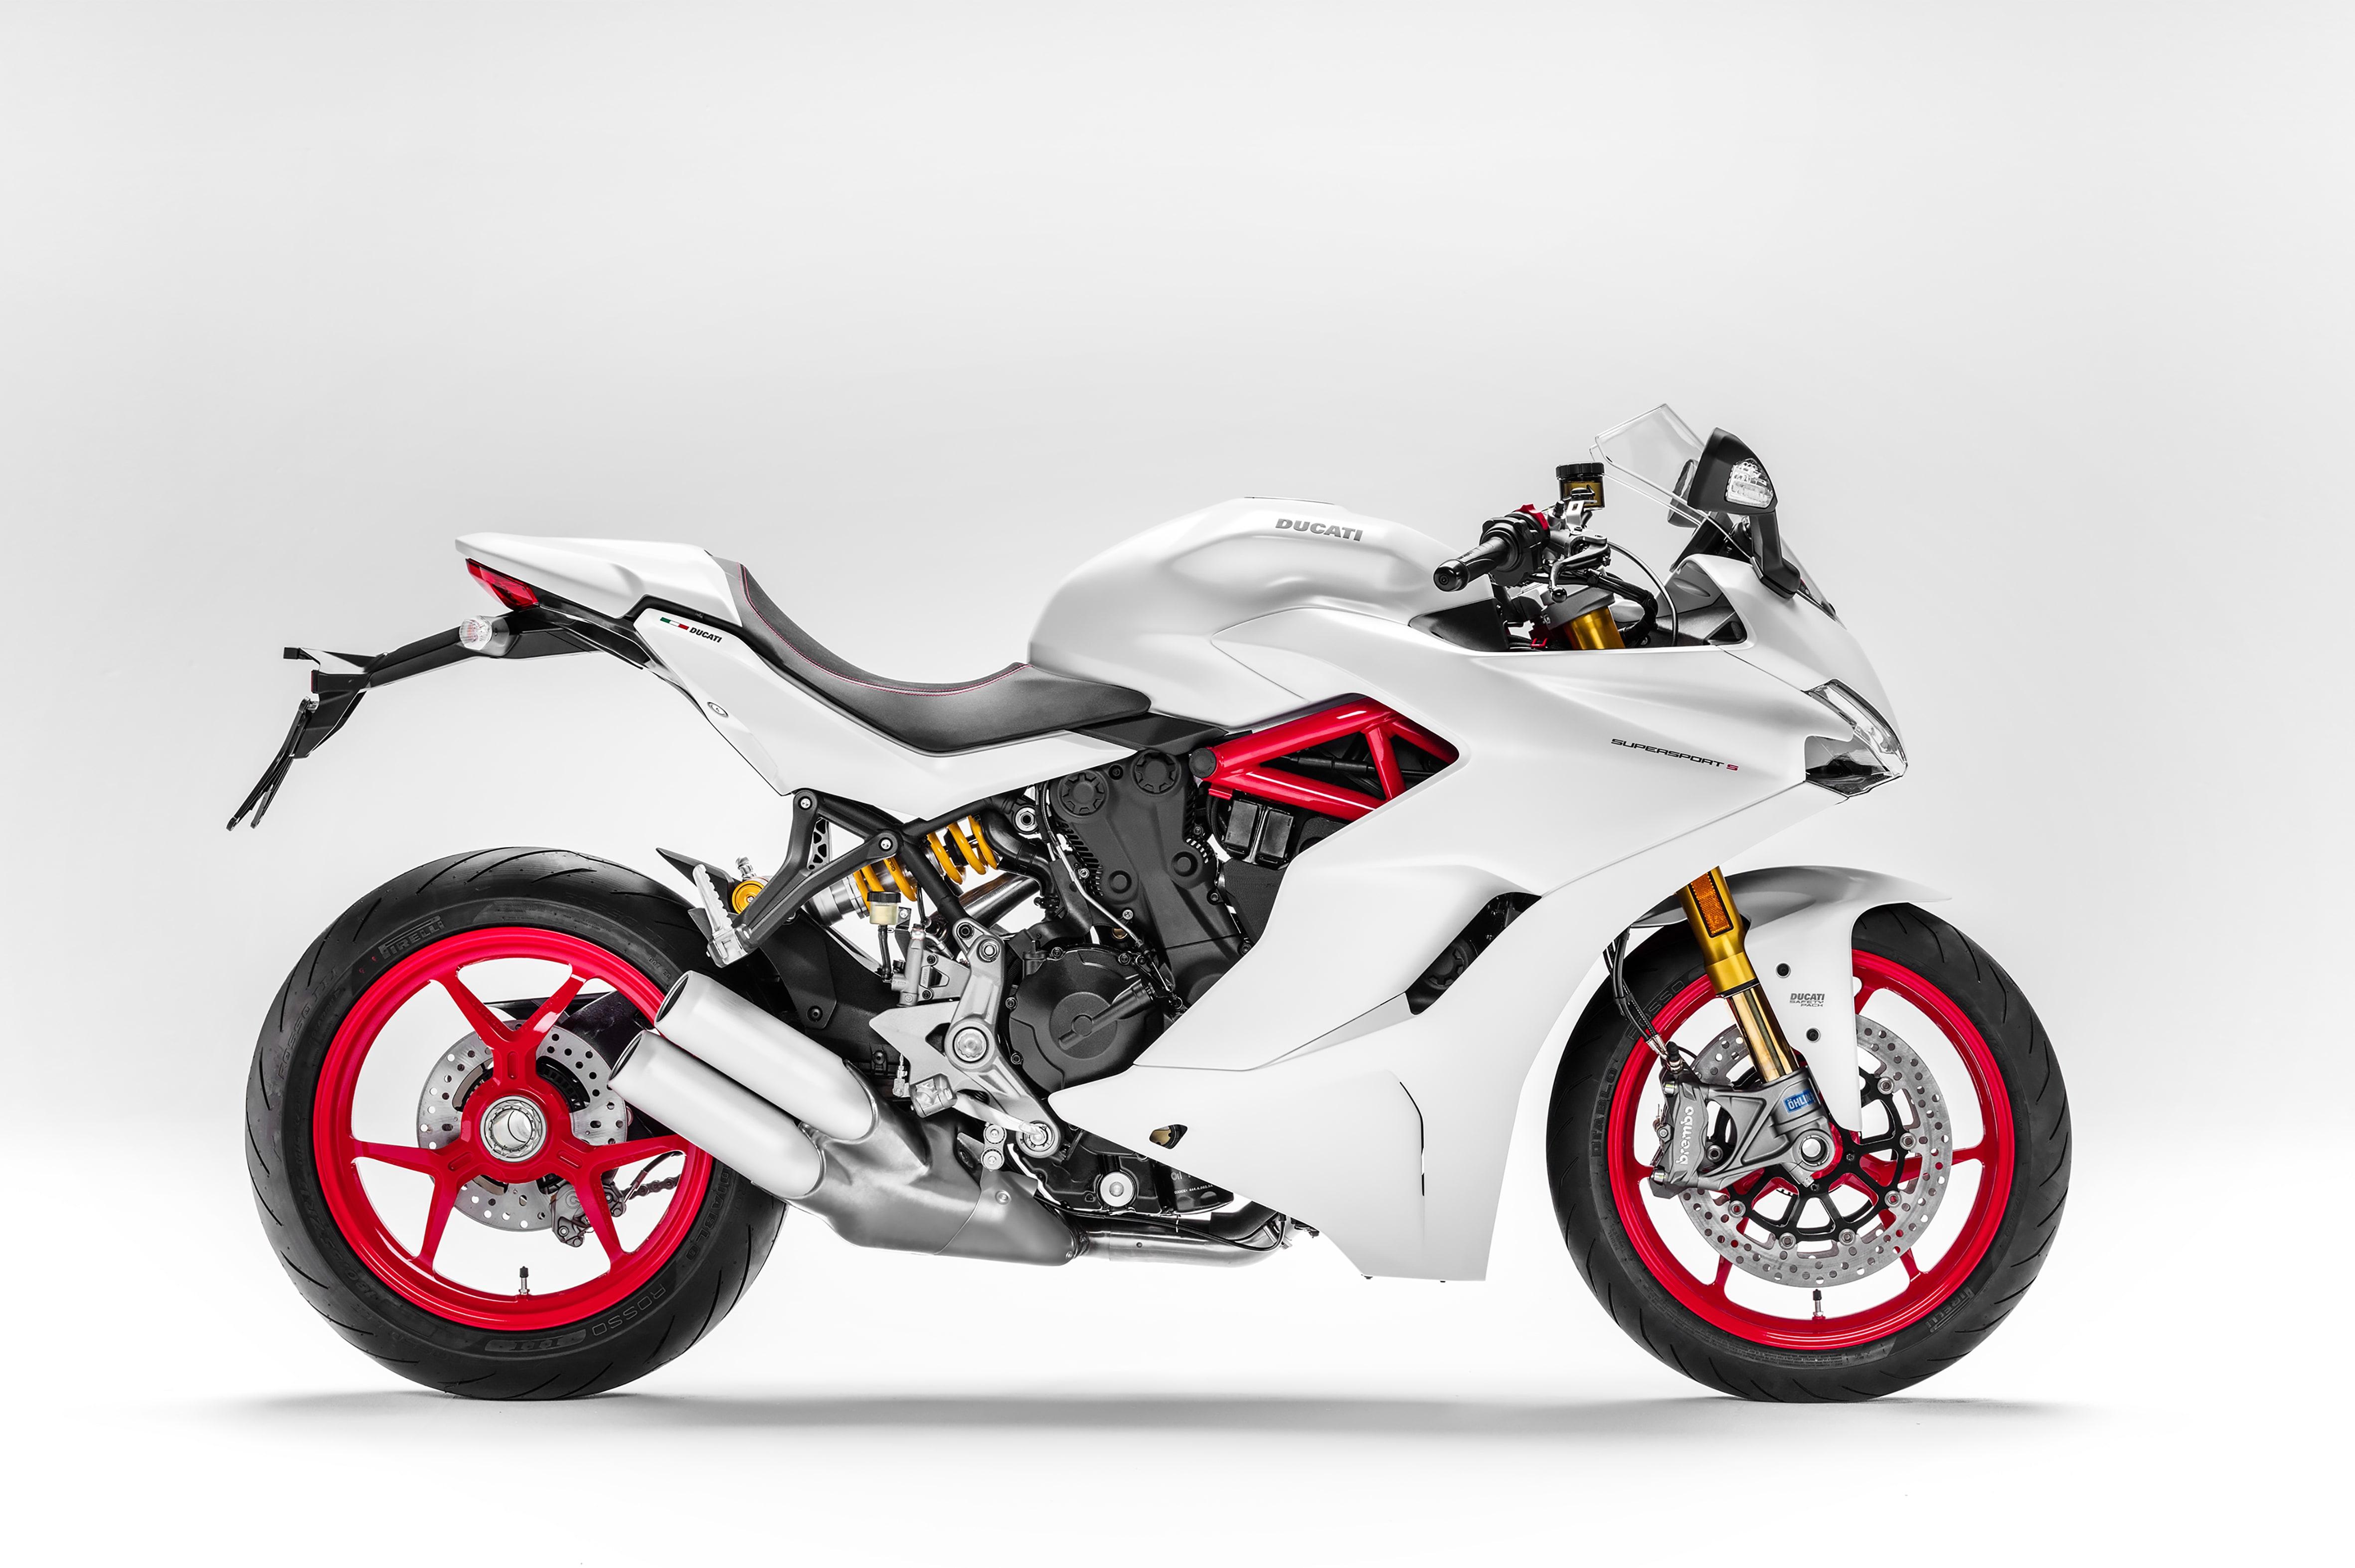 Ducati Supersport nuovi modelli 2017